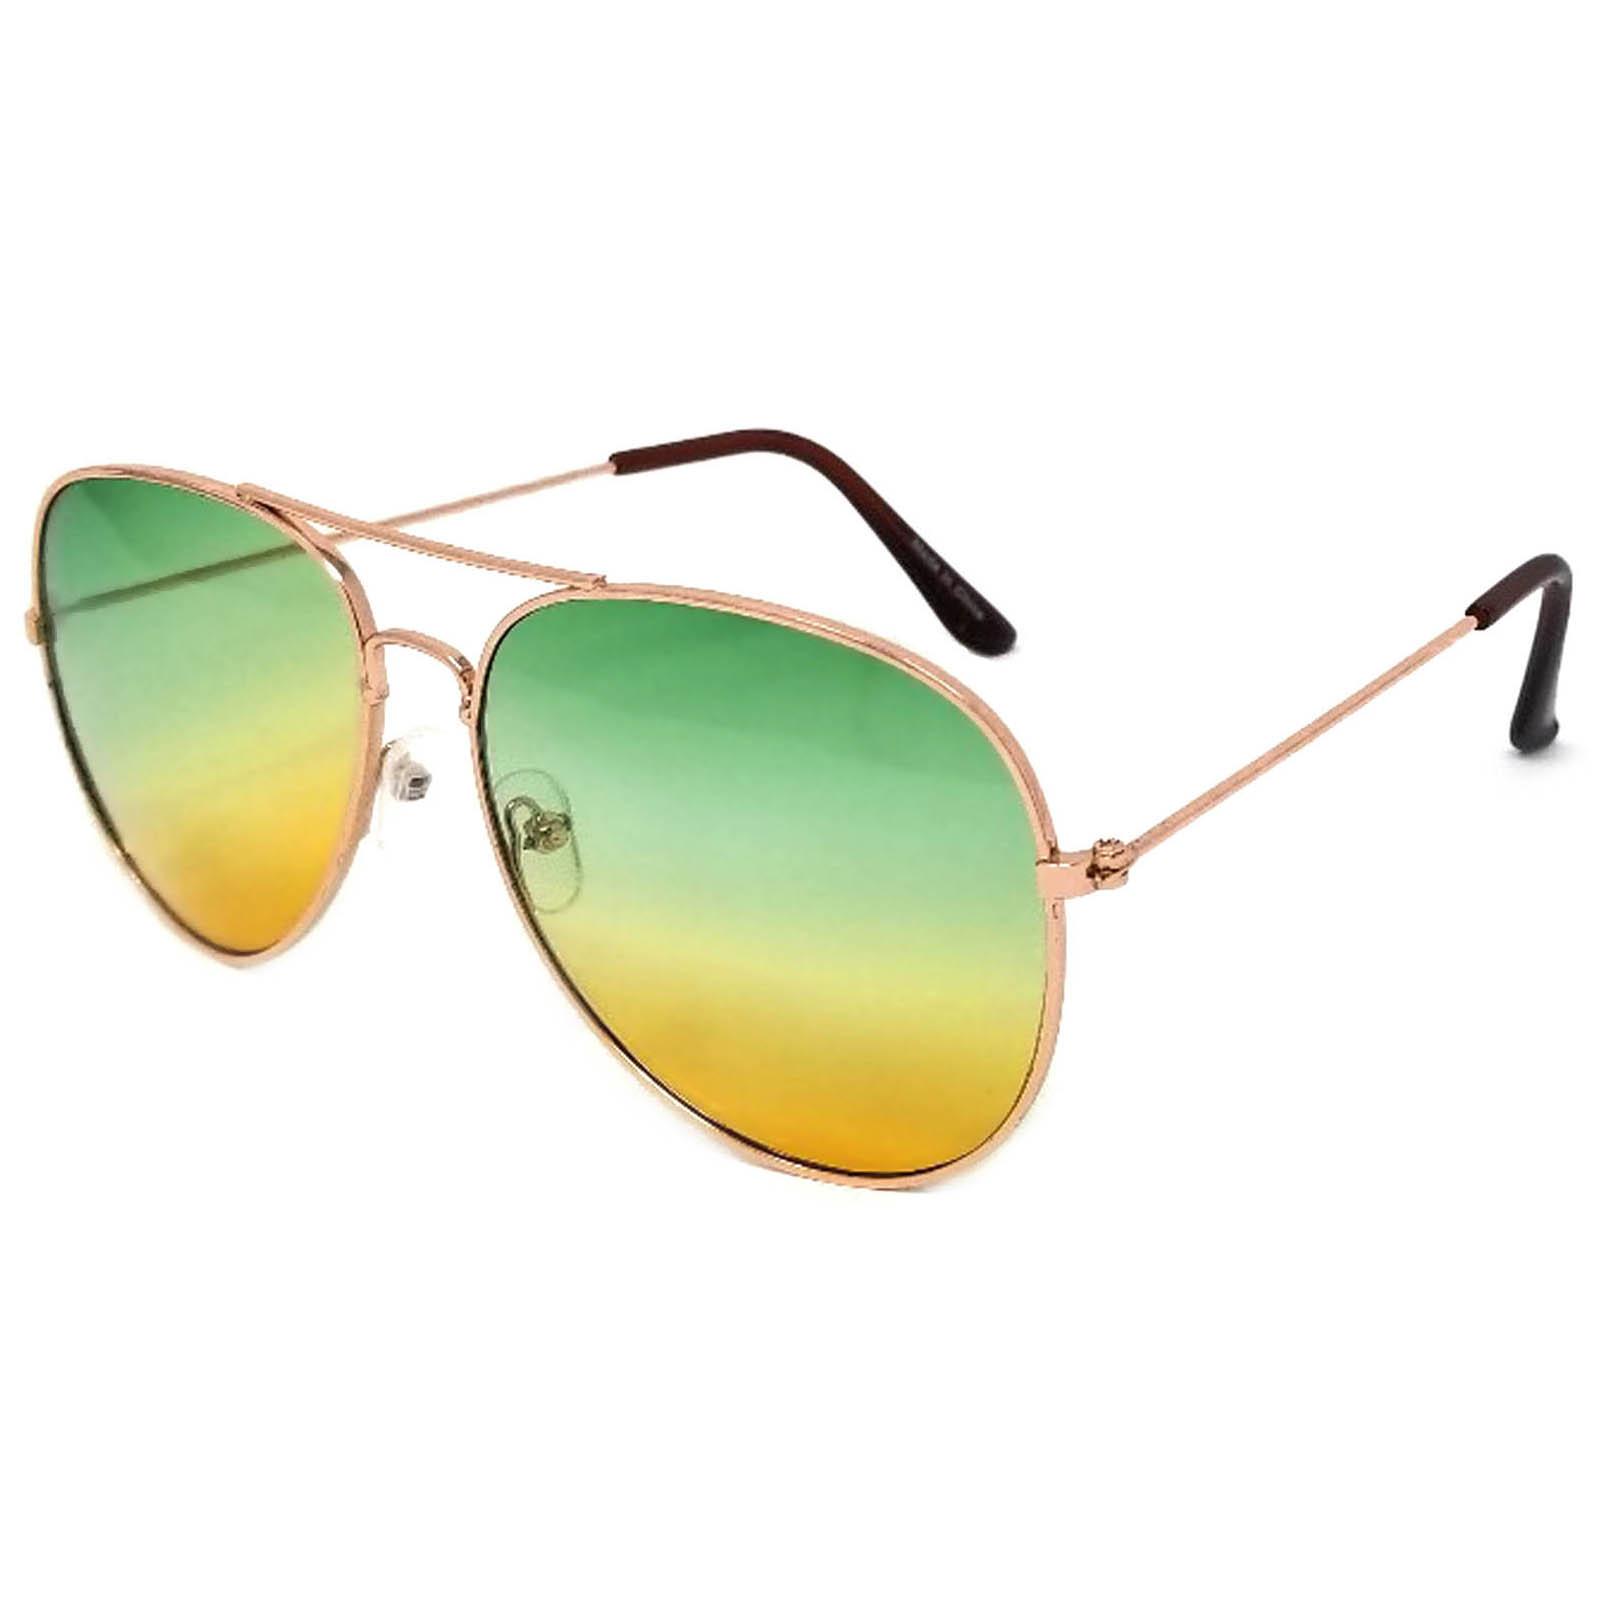 buy online aviator 2 tone color lens green yellow